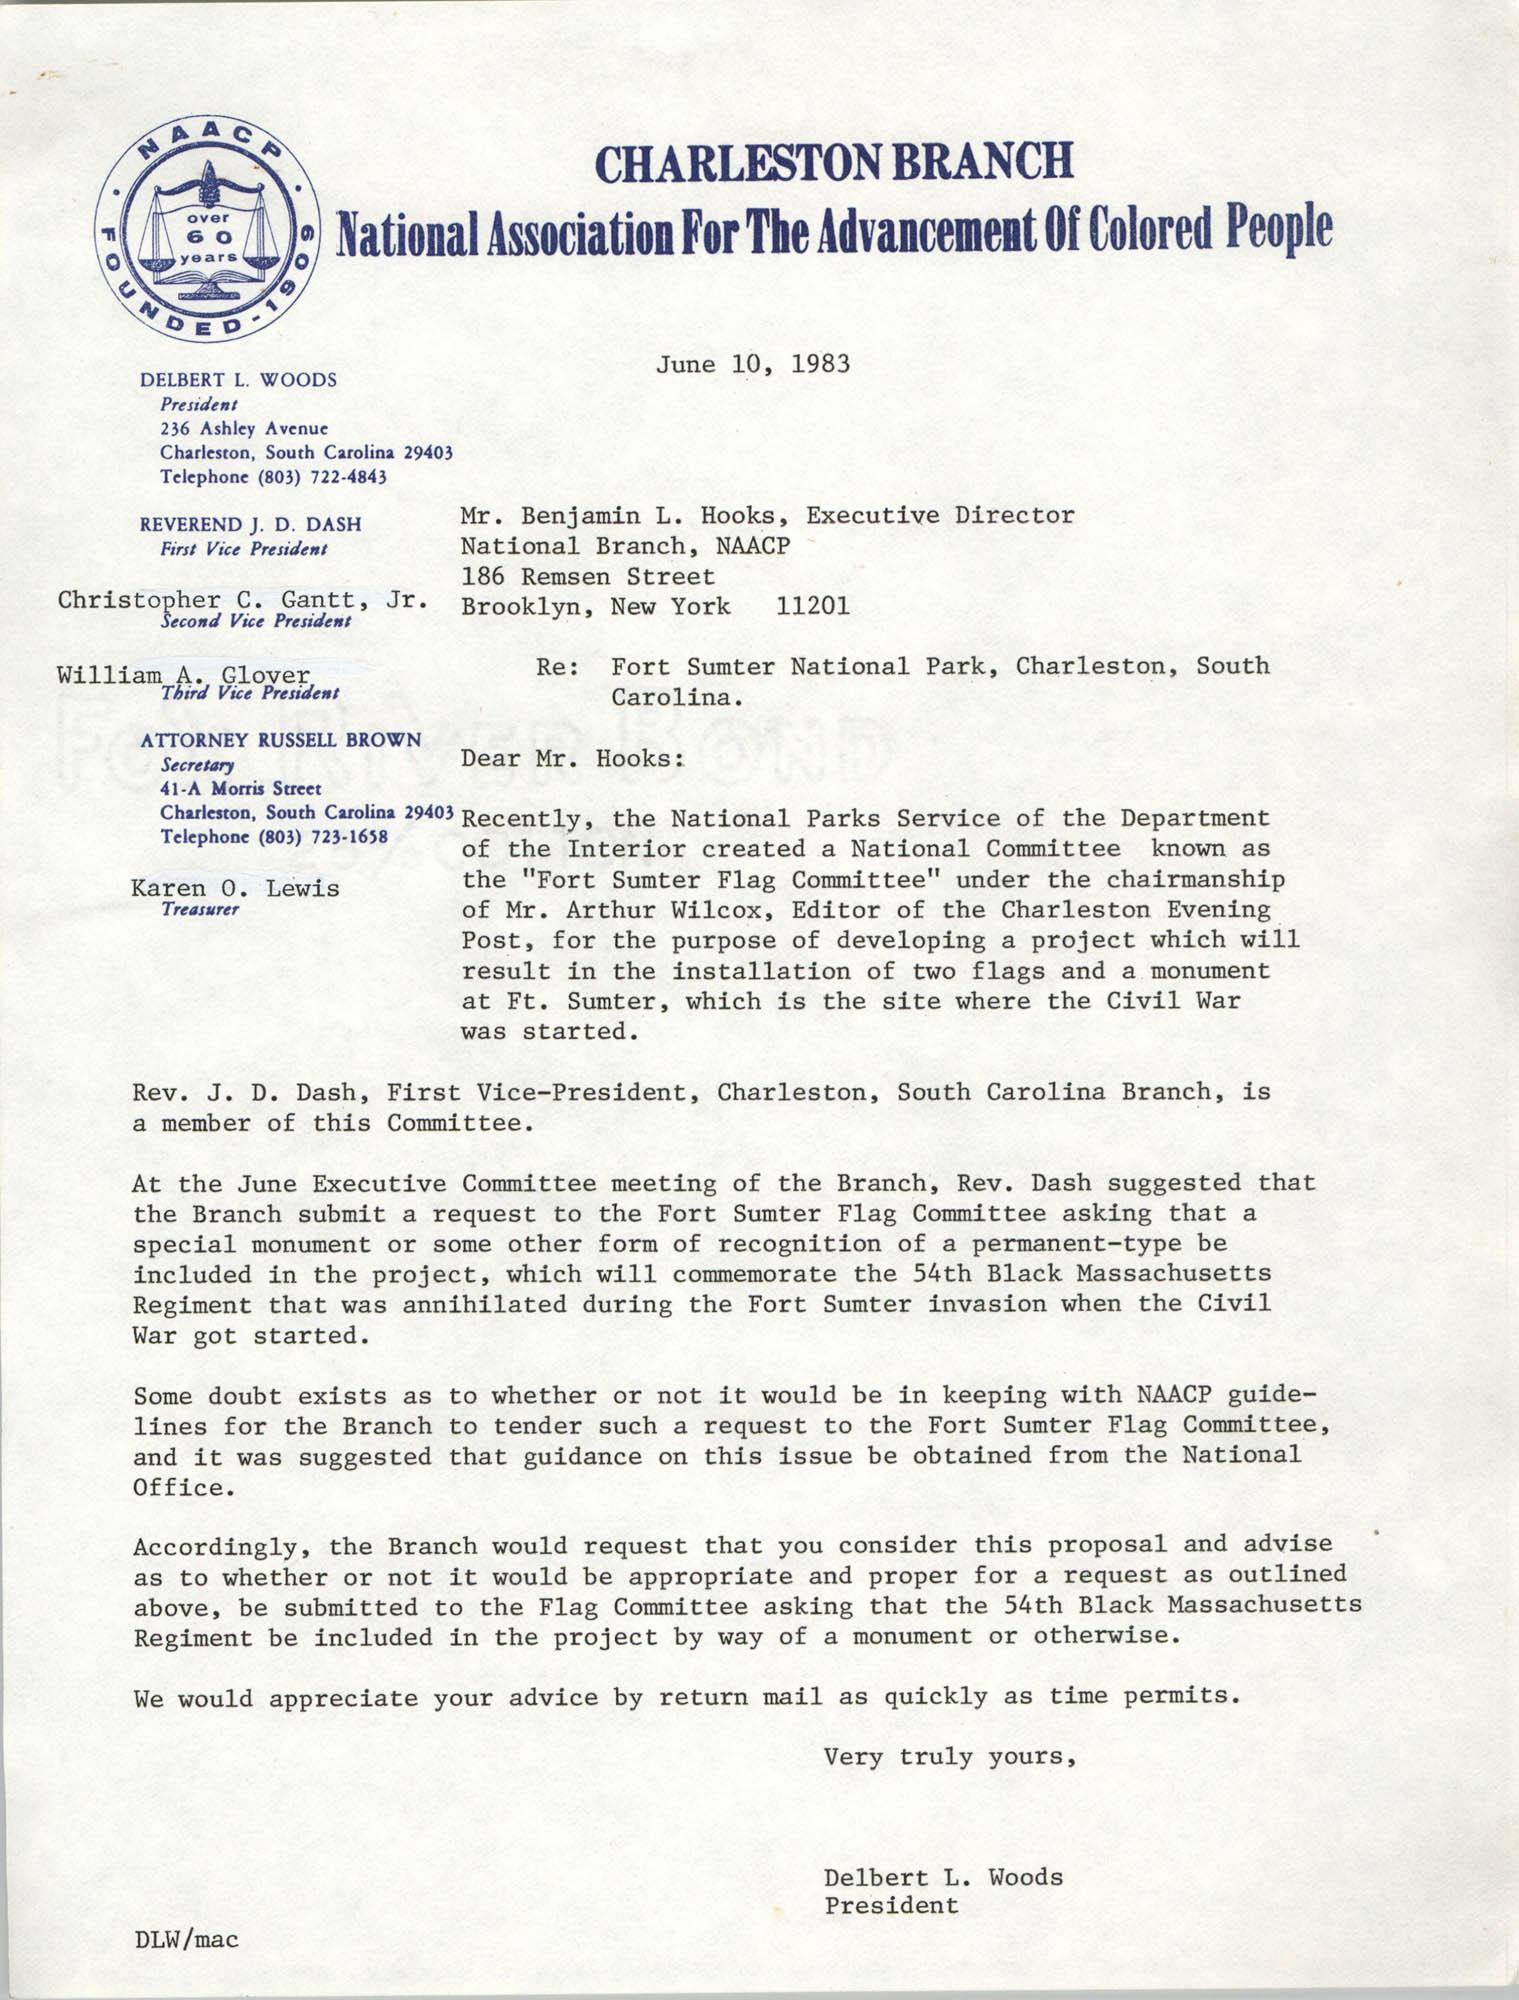 Letter from Delbert L. Woods to Benjamin L. Hooks, June 10, 1983